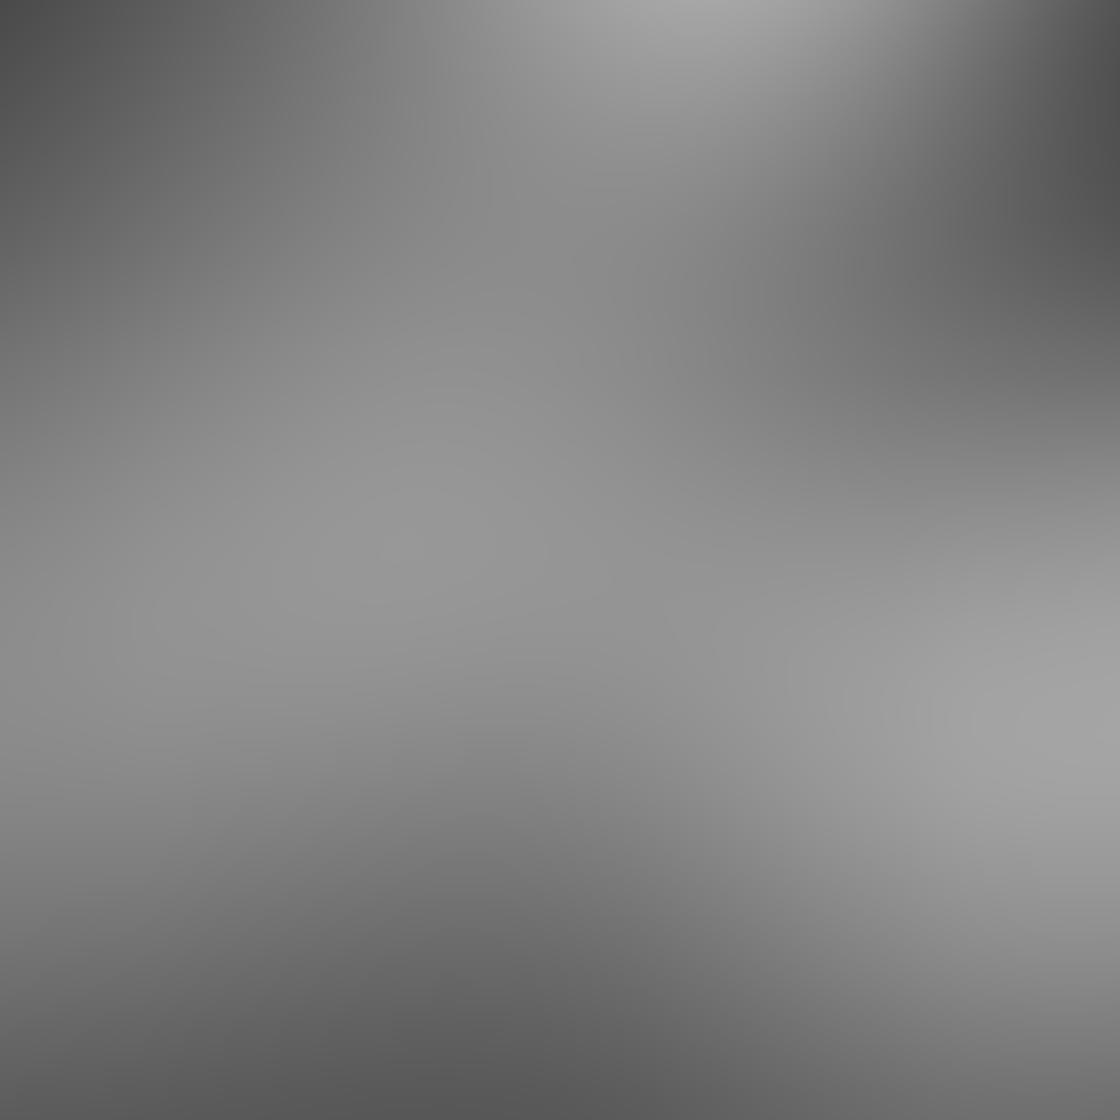 iPhone Photos Negative Space 32